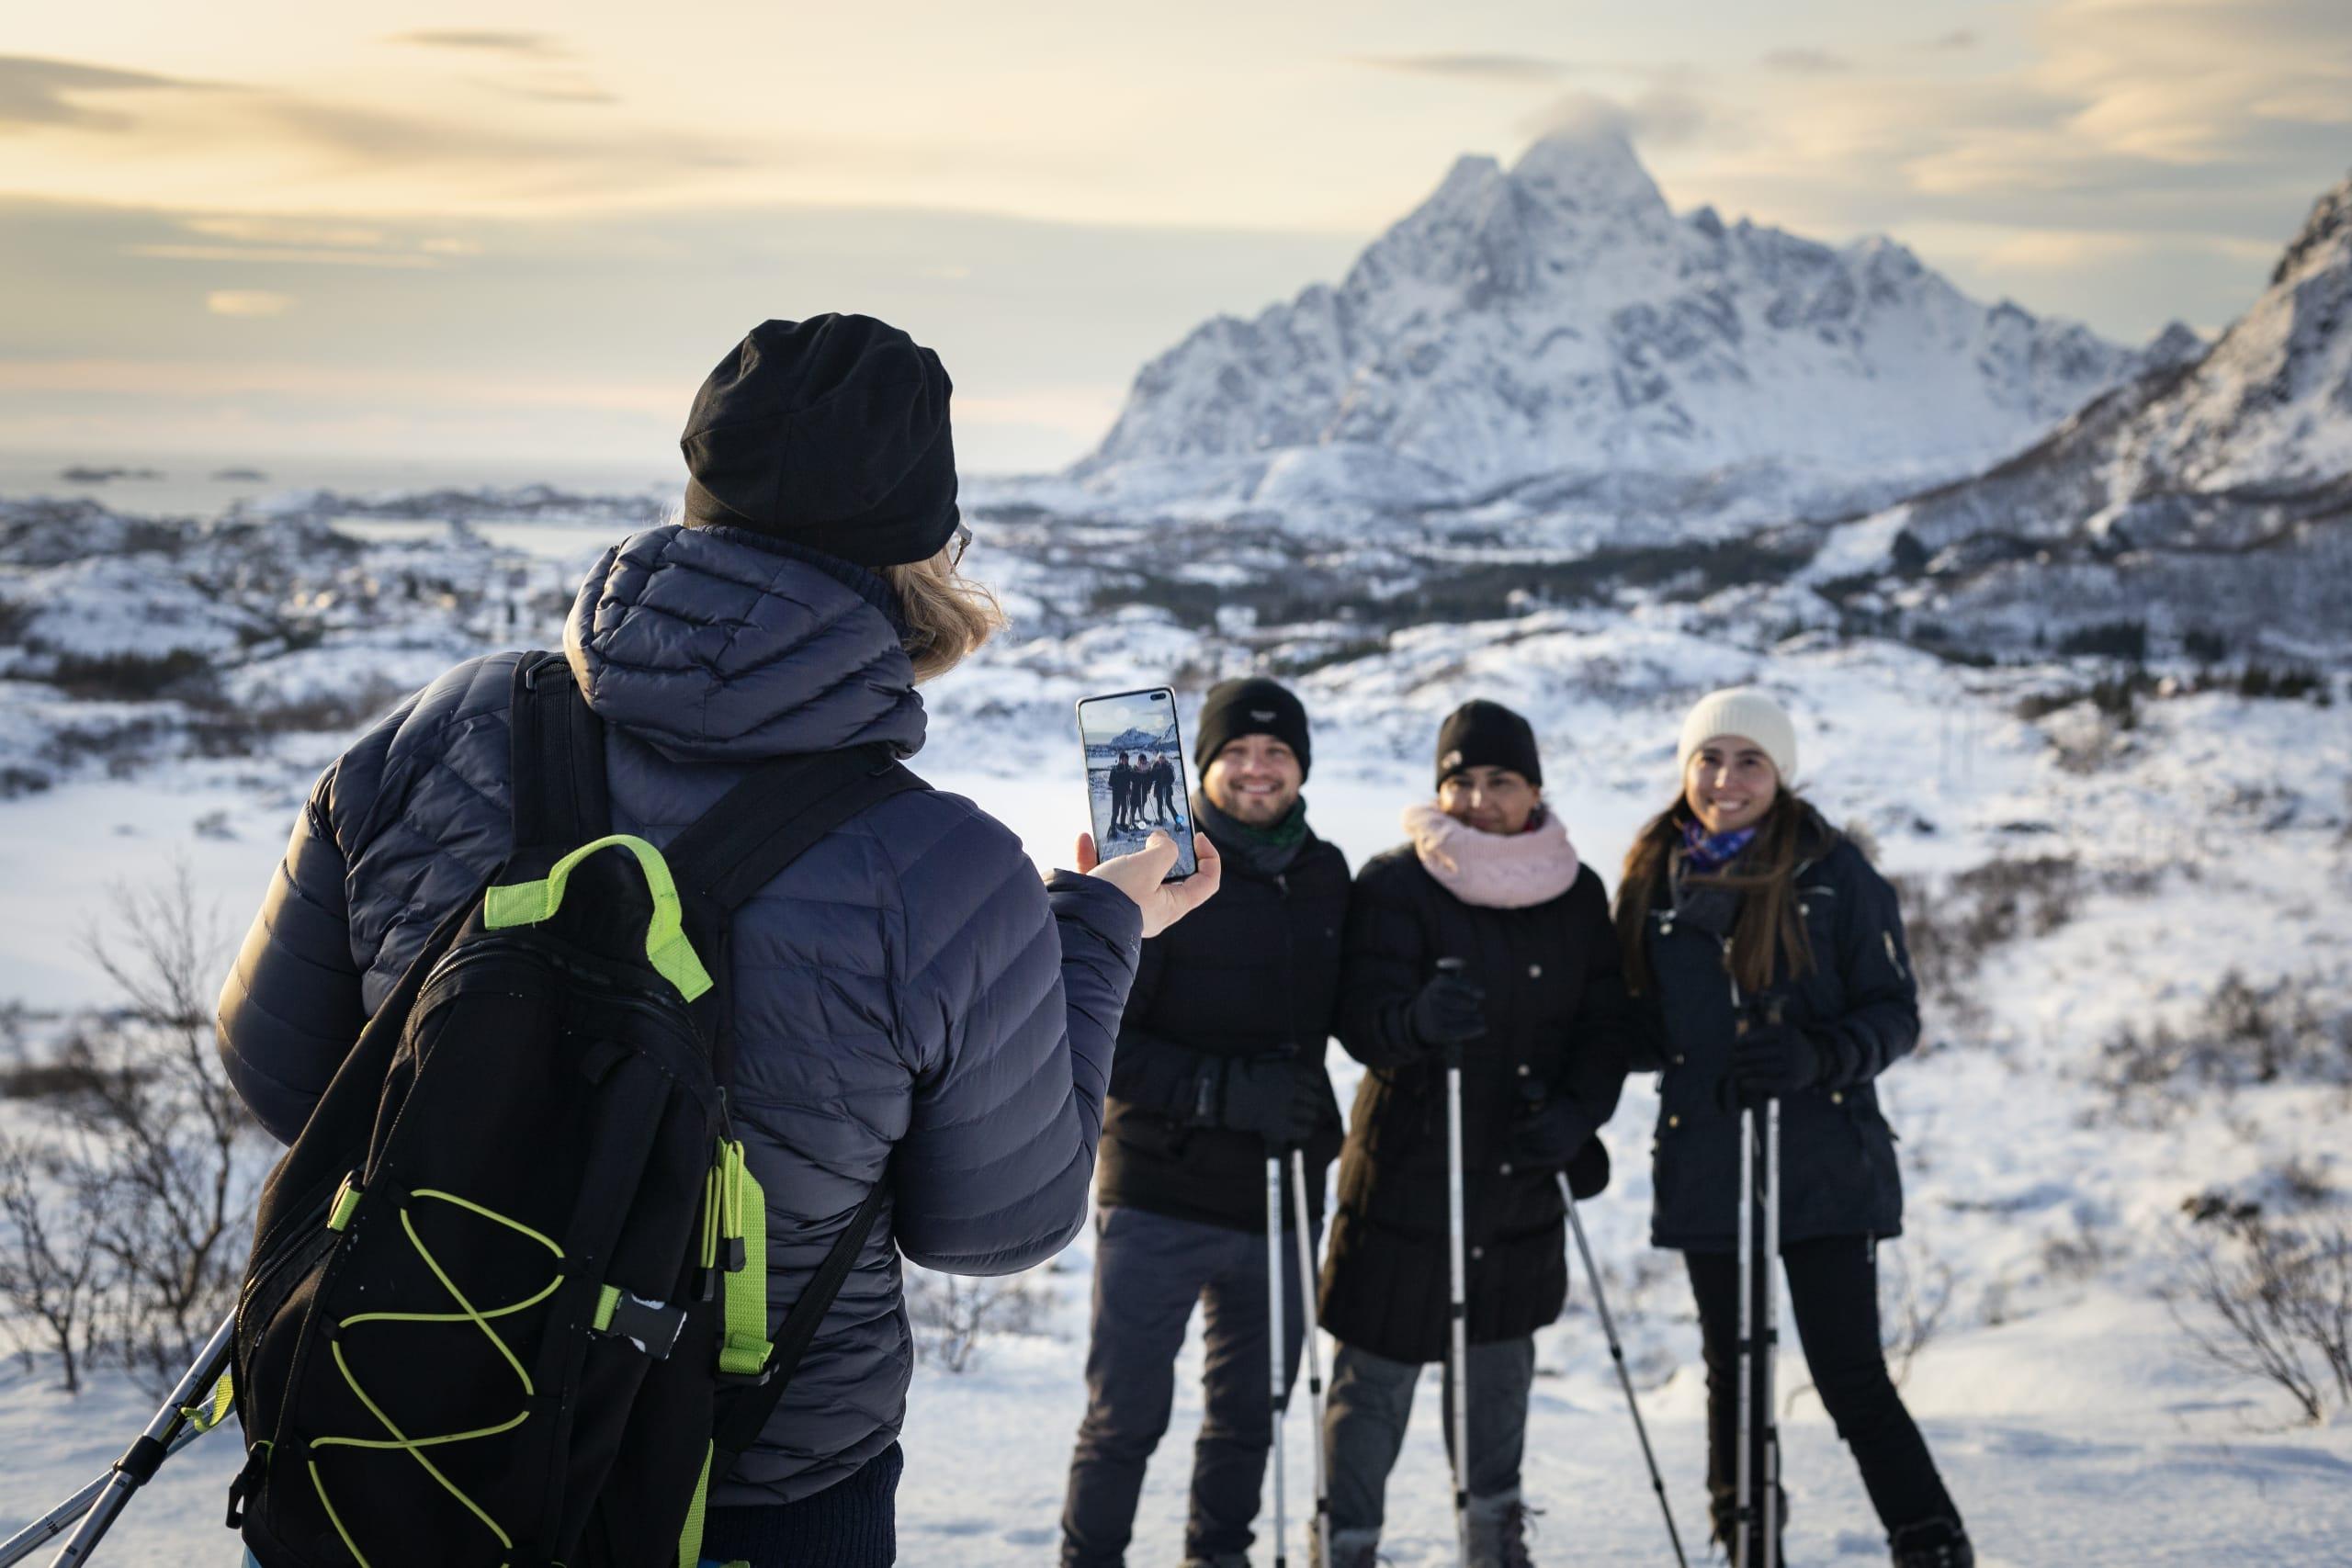 Snowshoeing hikers taking photos